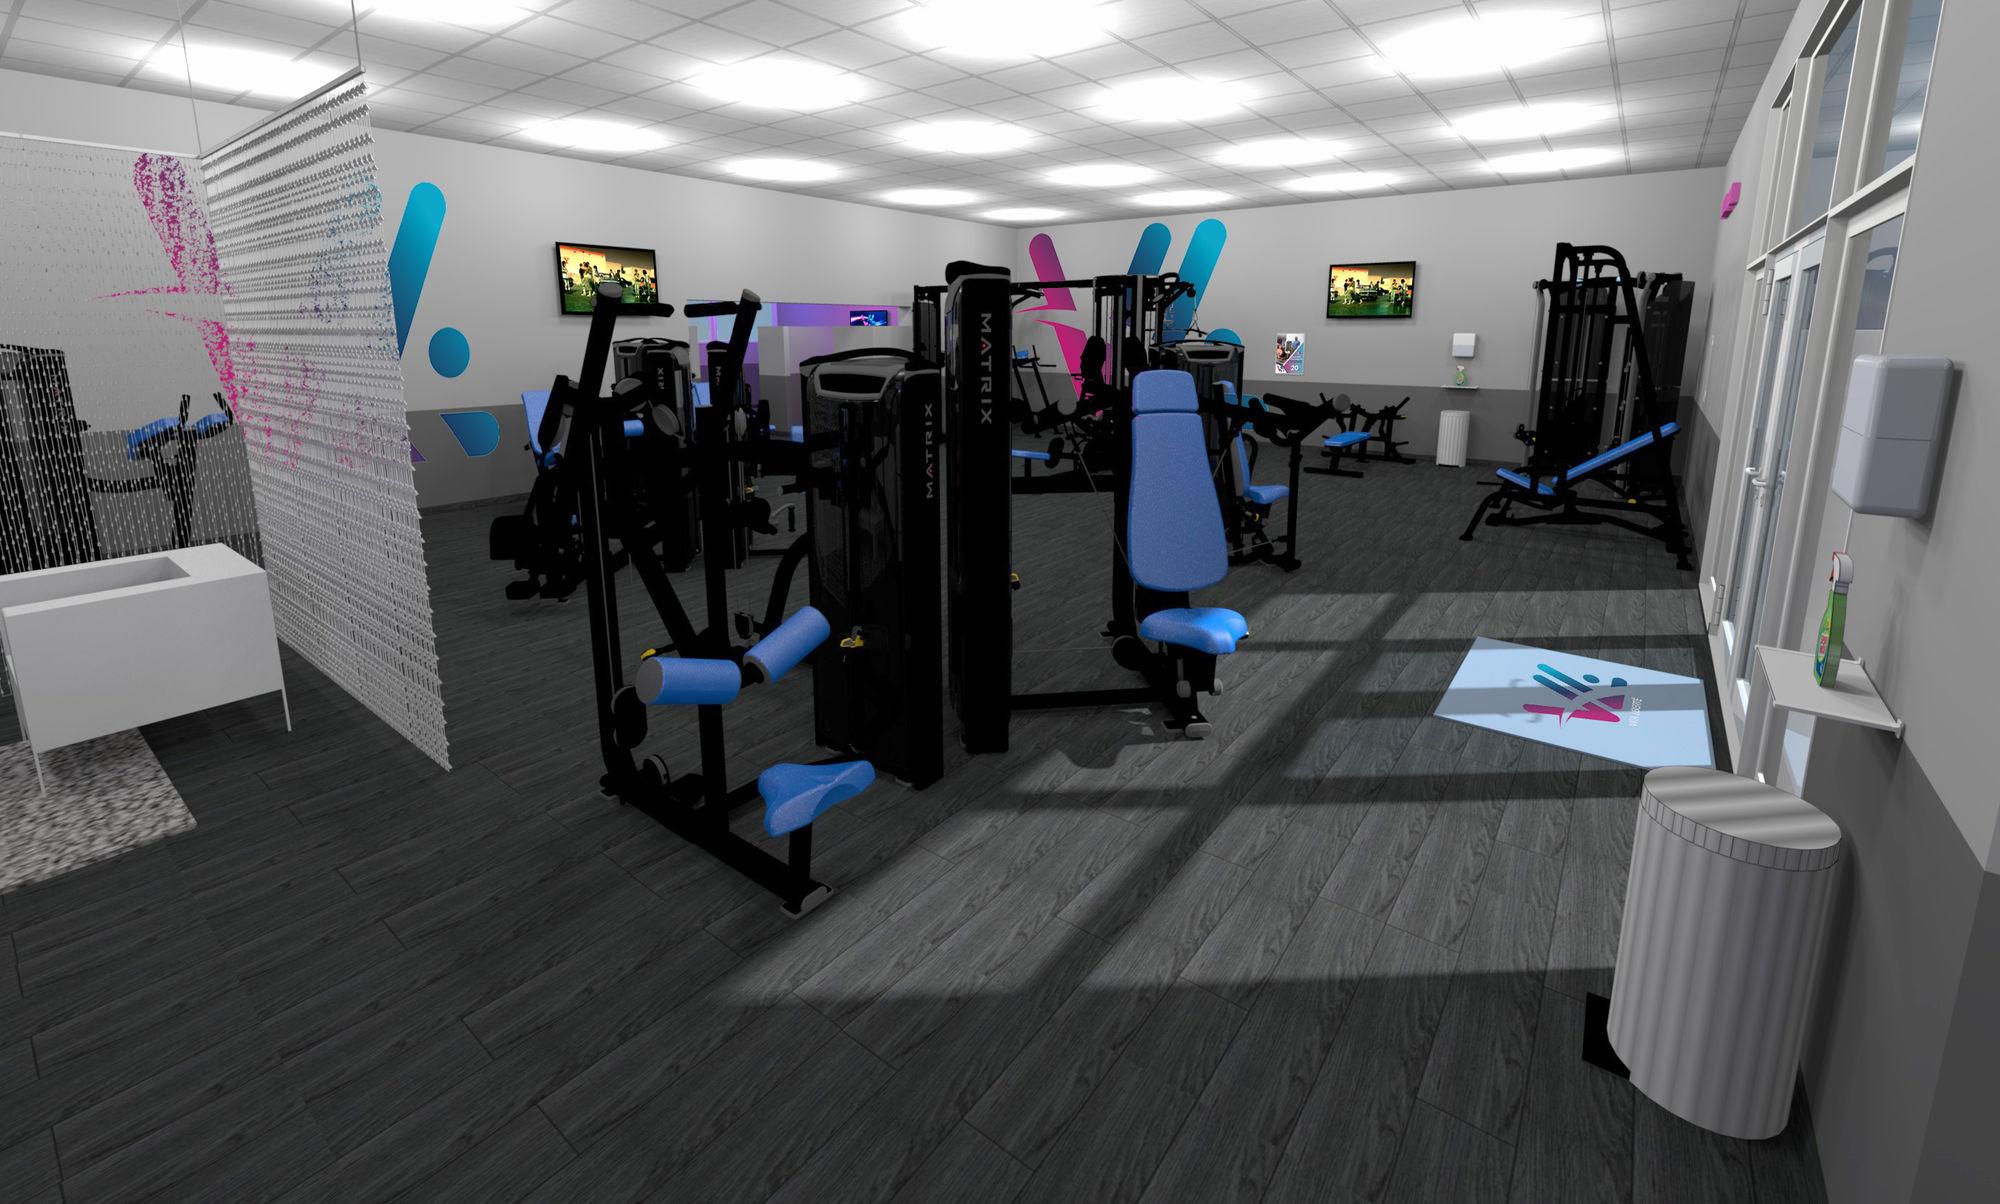 Salle de sport Vita liberté la Fare-les-Oliviers musculation